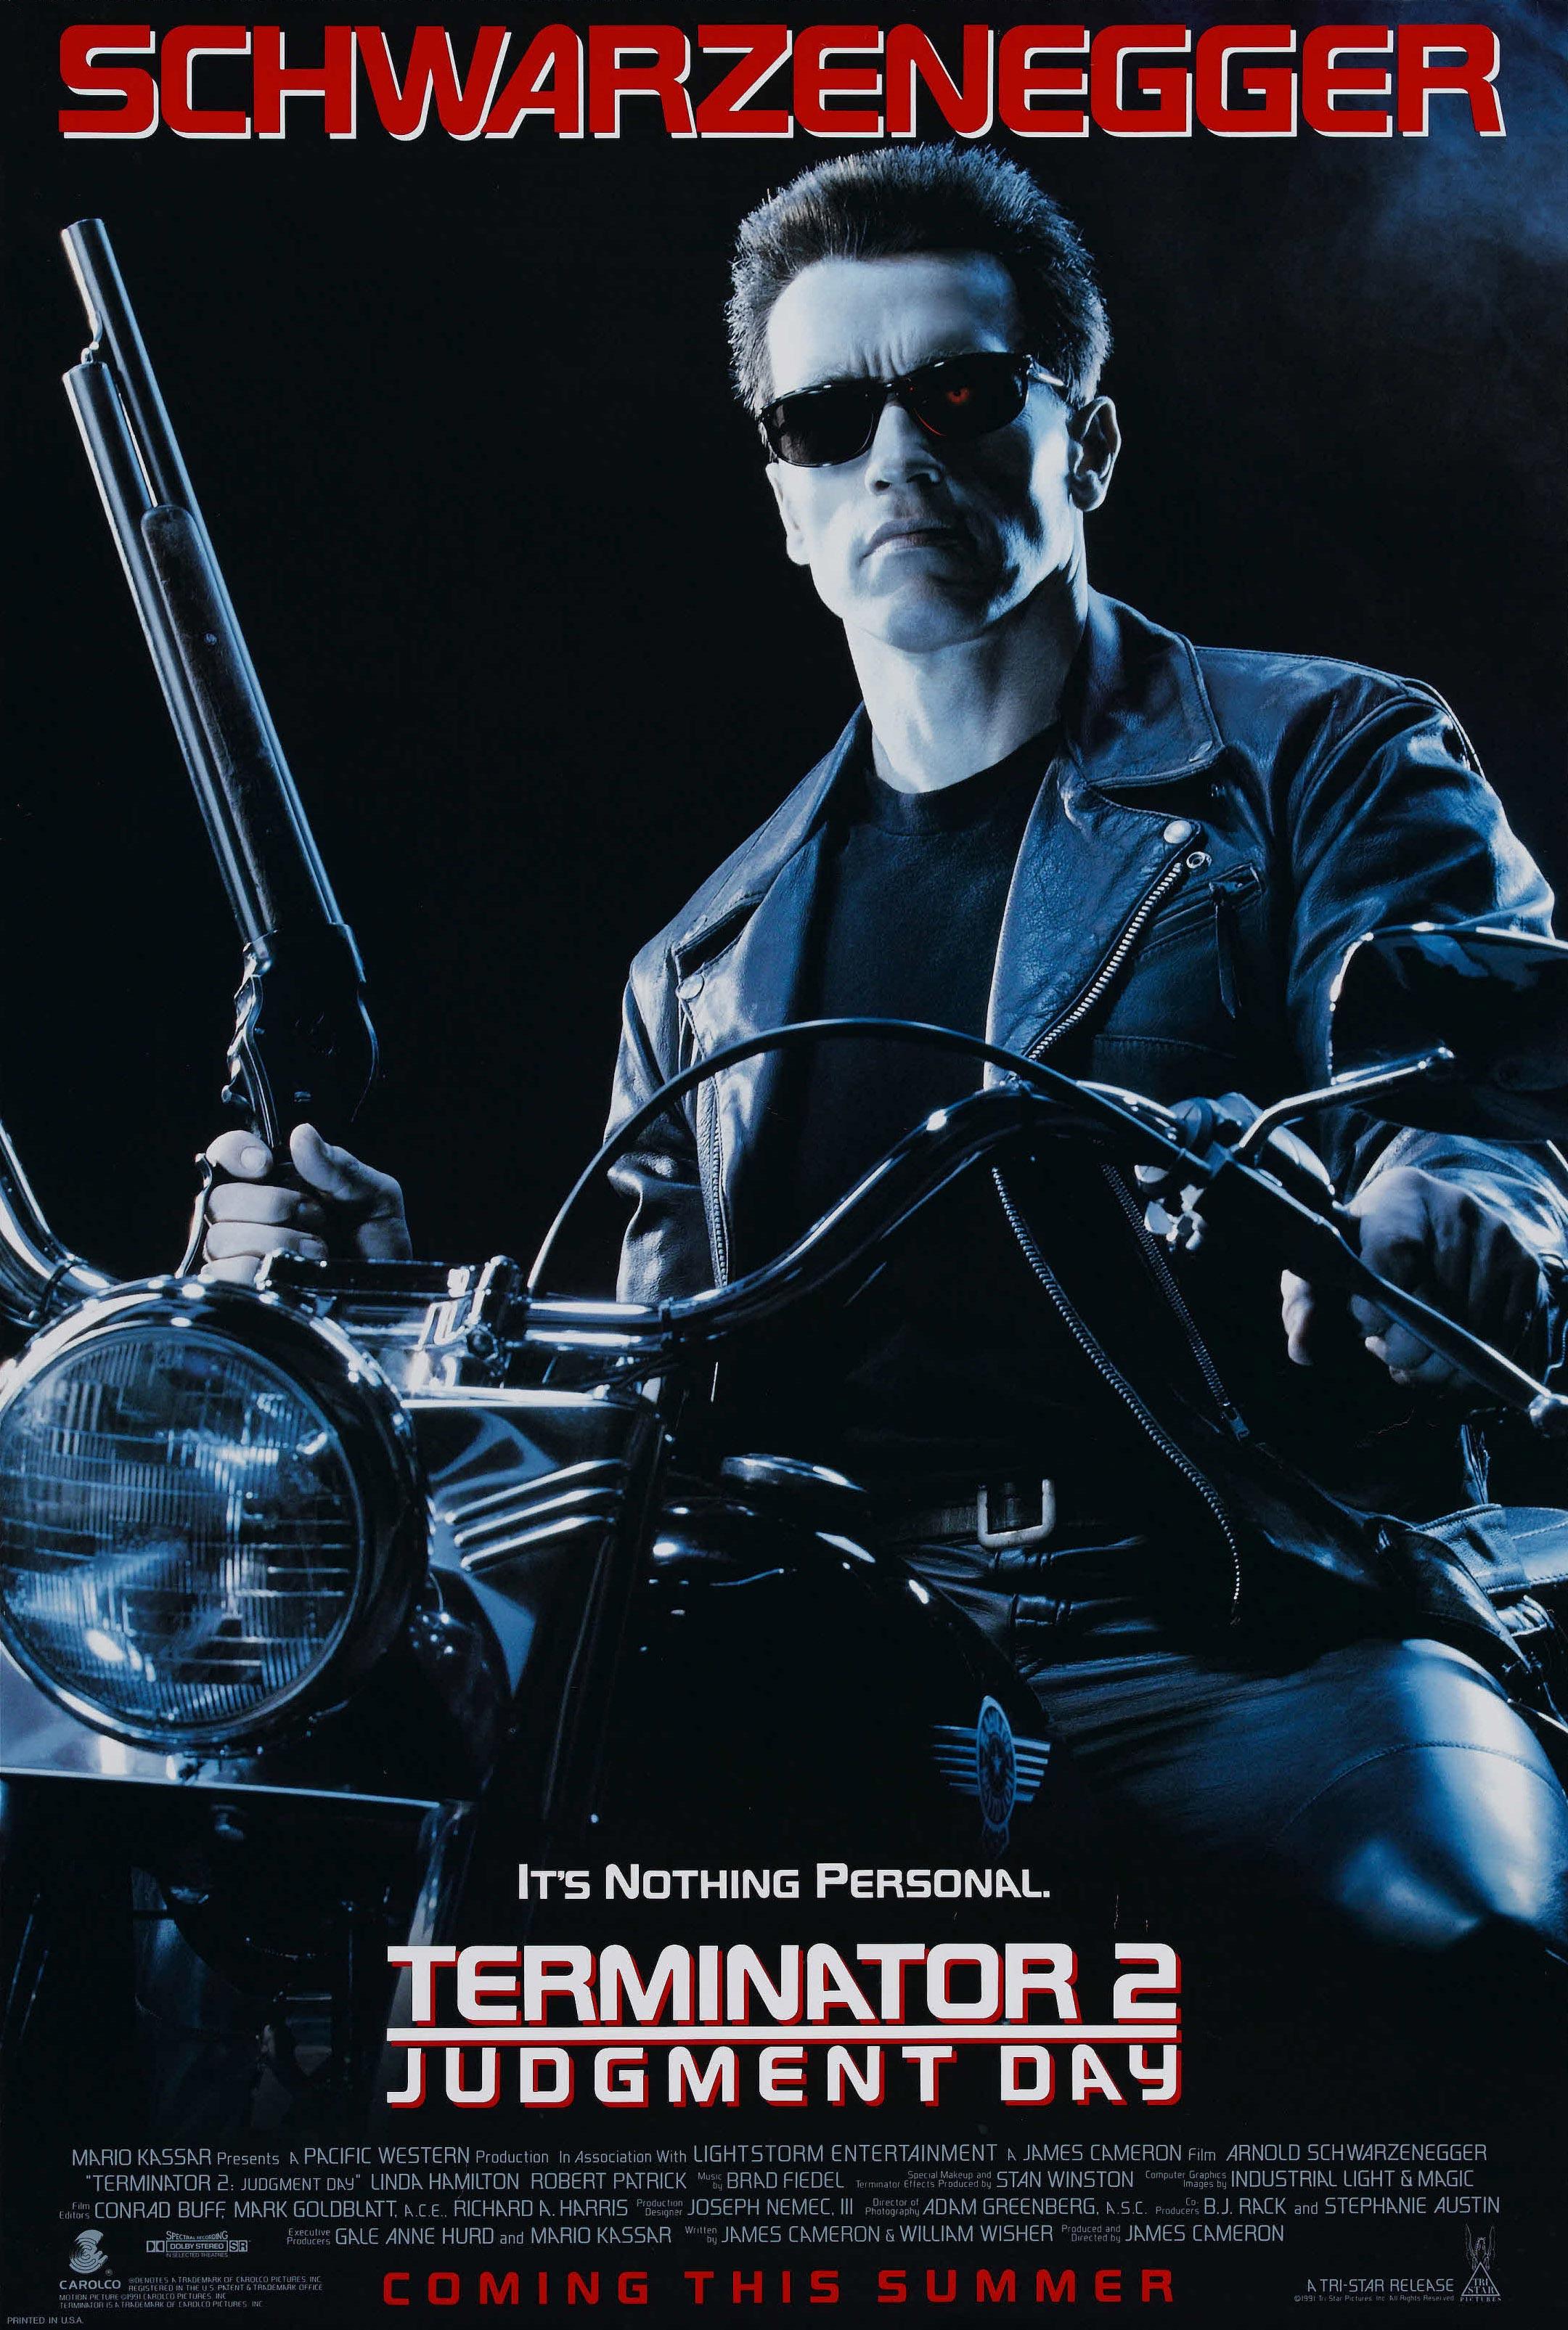 Terminator 2 poster